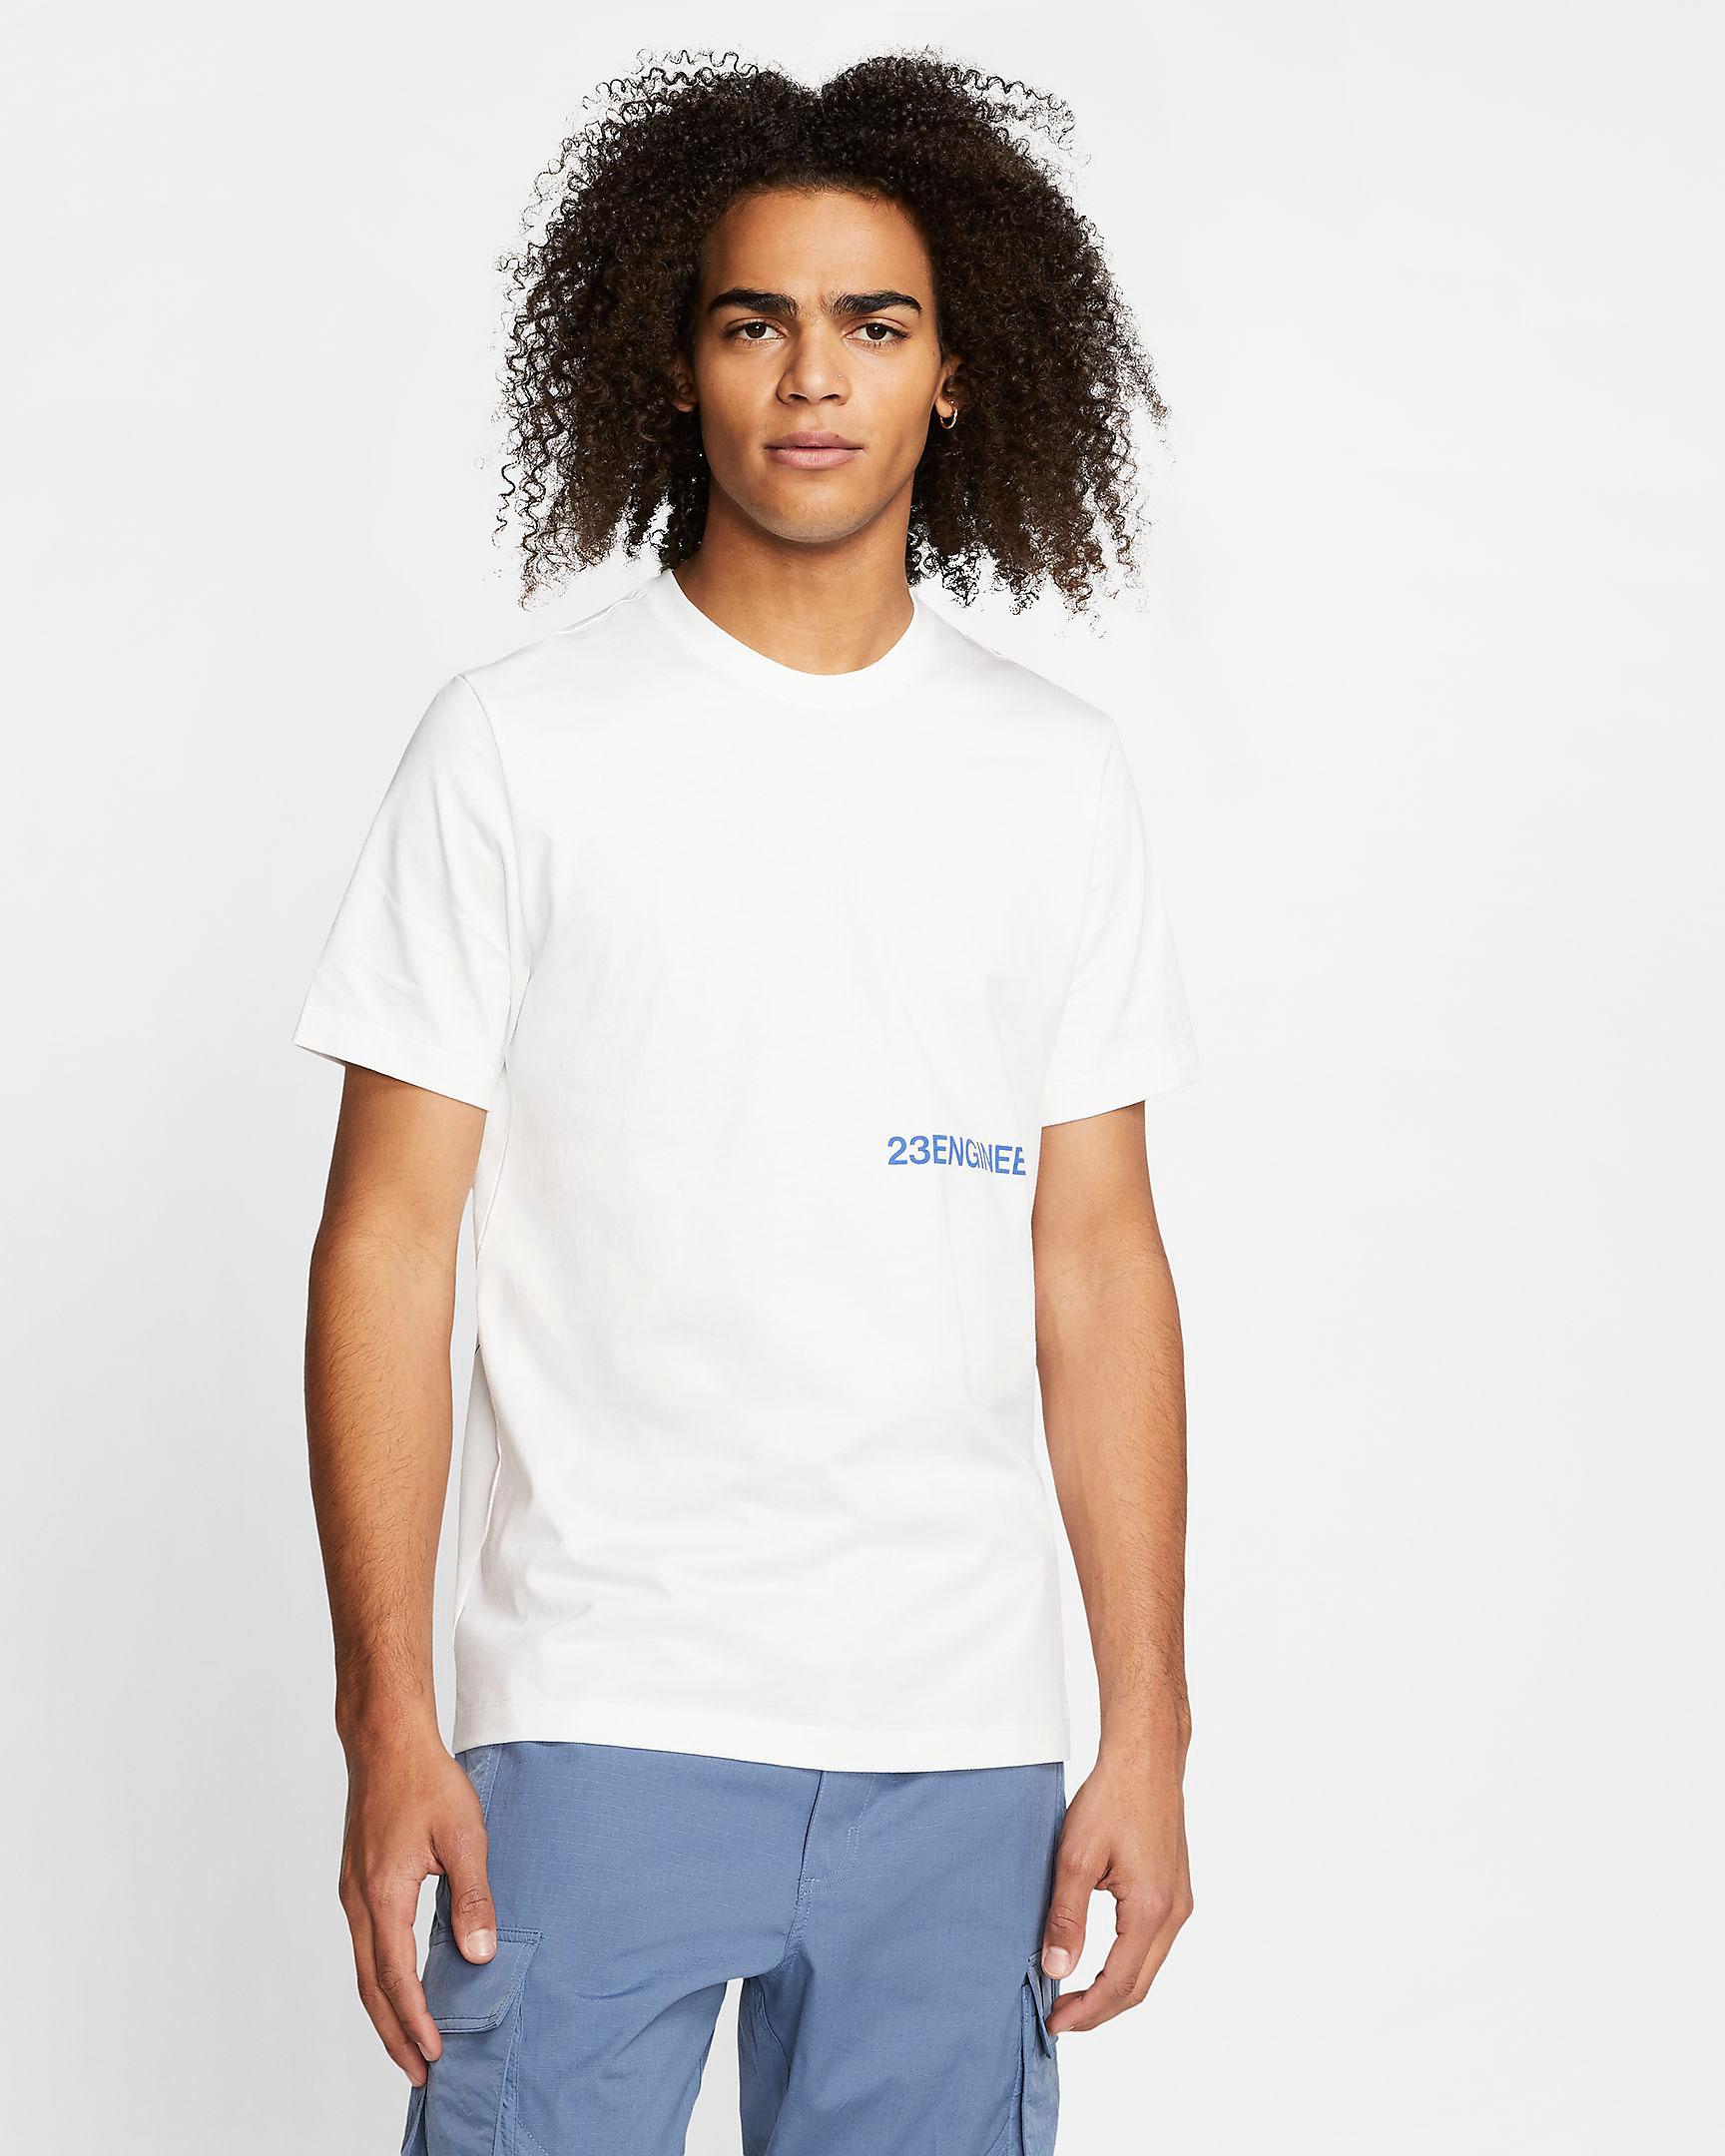 jordan-aerospace-720-lyrical-lemondade-tee-shirt-match-1